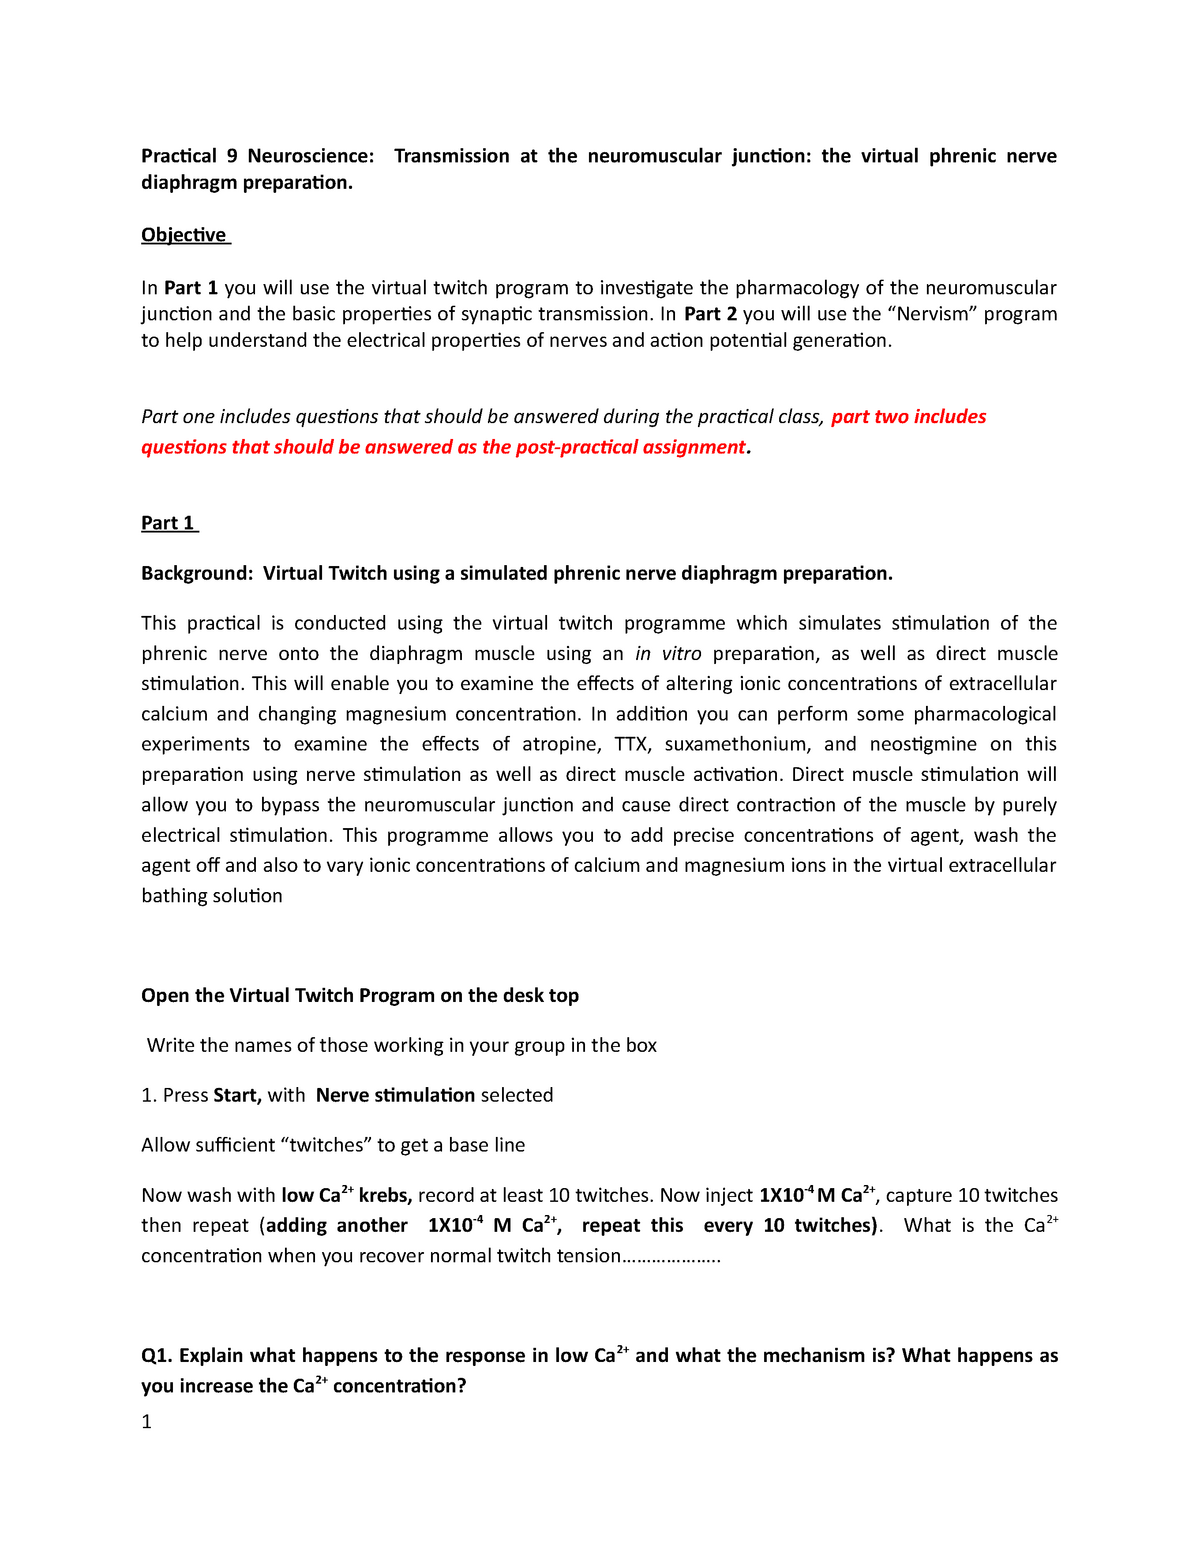 Biomolecular lab skills Lab manual 9 - BMOL20070